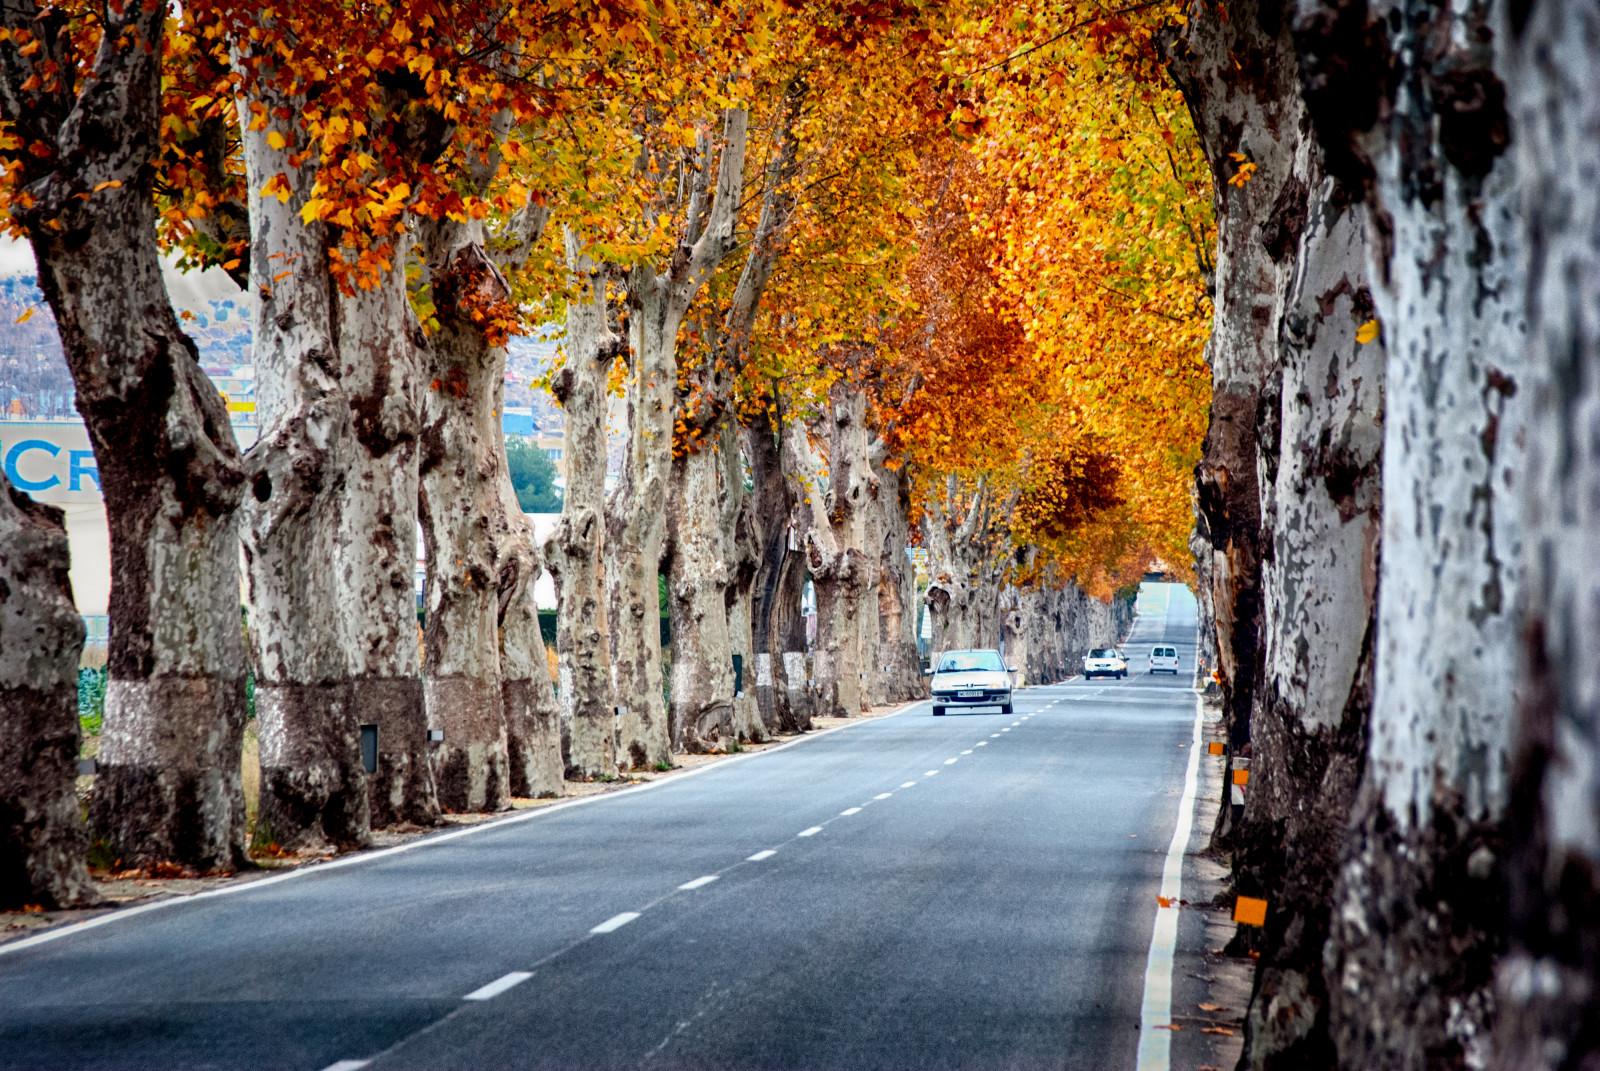 Fall Season Wallpapers Hd Wallpaper Sunlight Trees Landscape Colorful Fall